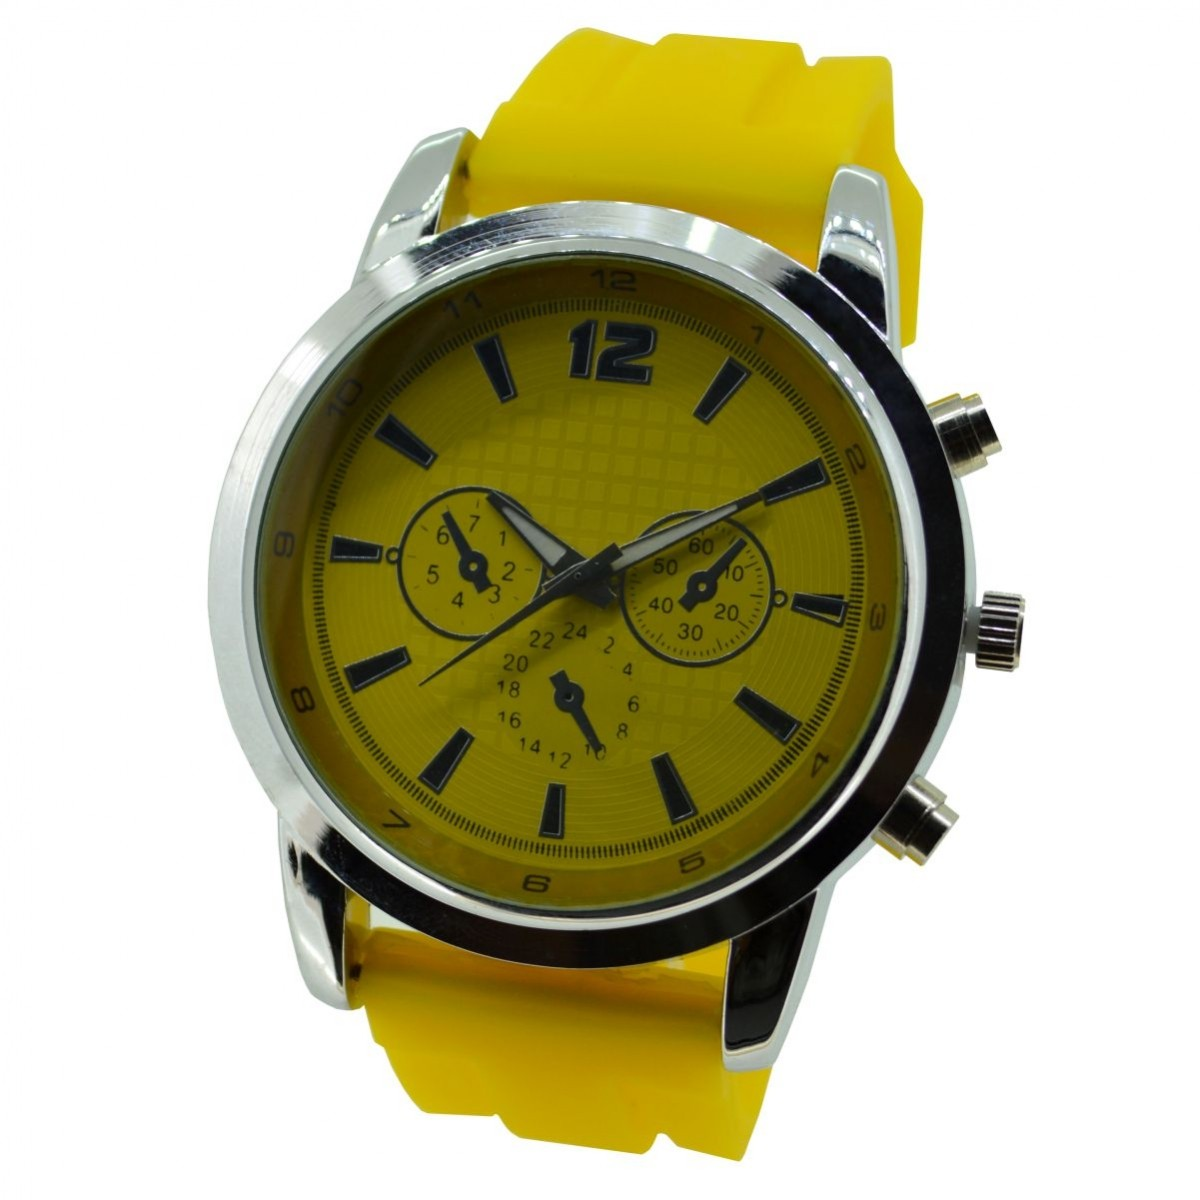 Relógio Personalizado 2477-4